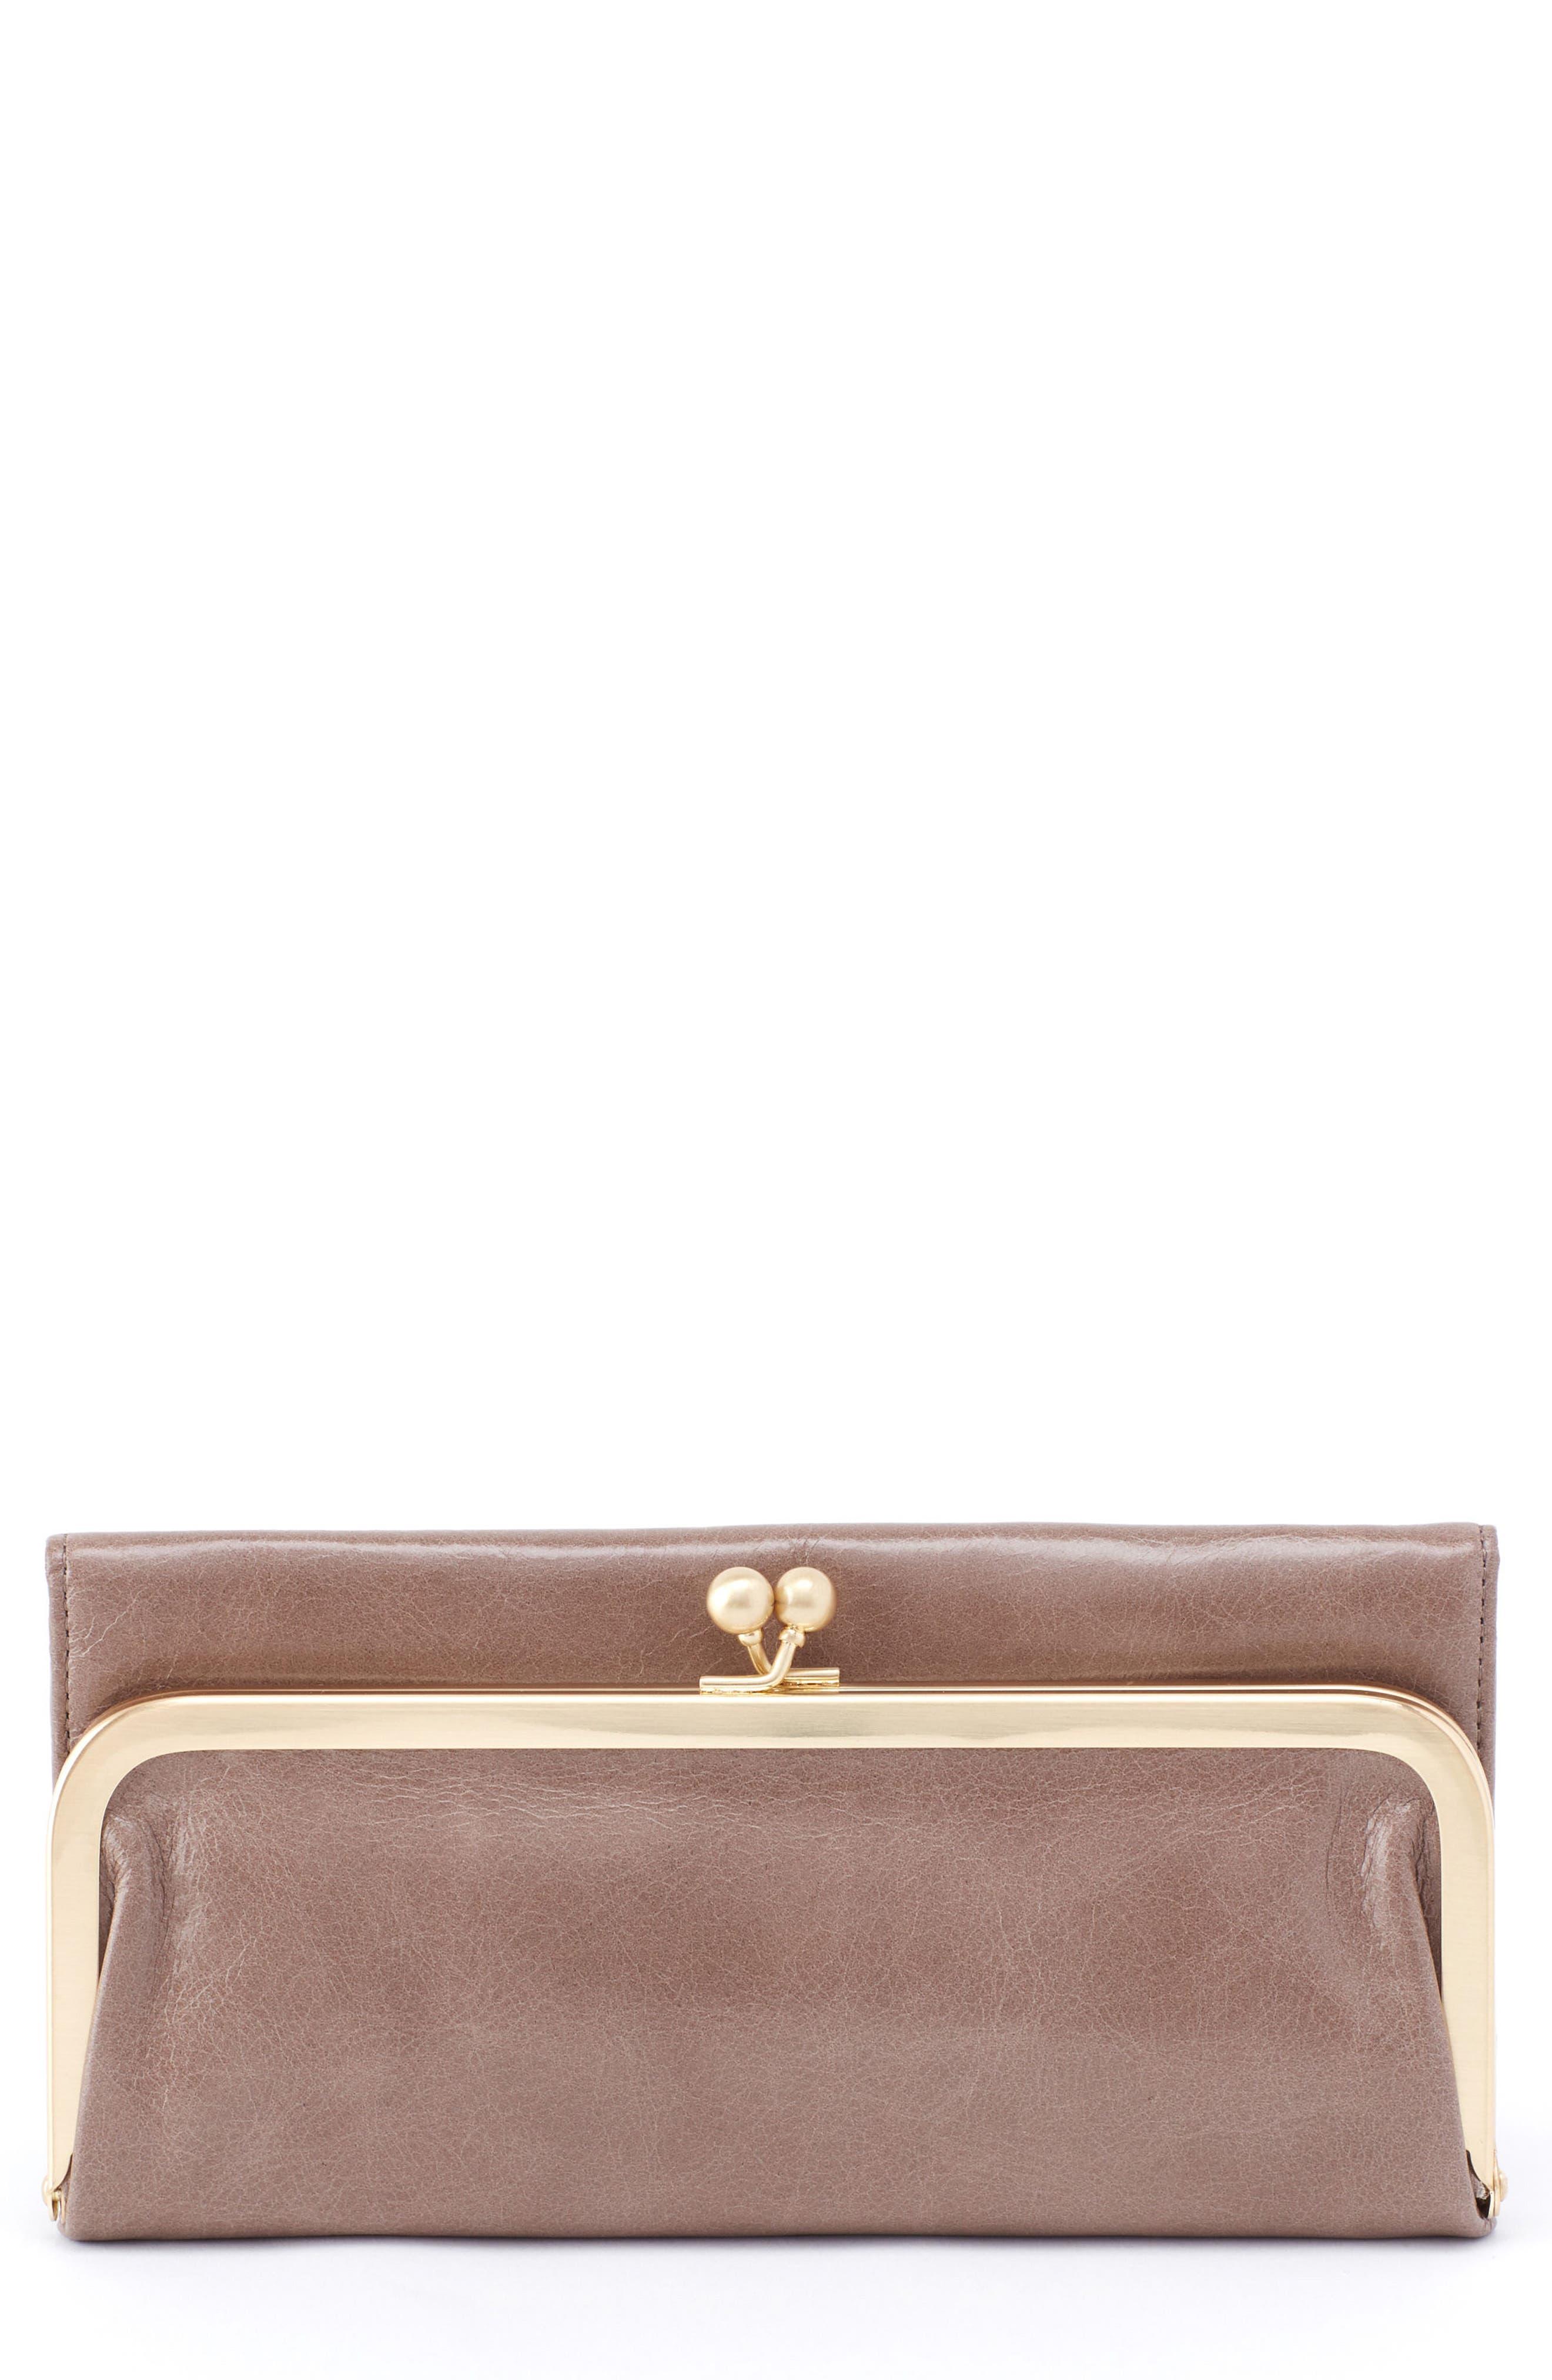 Rachel Frame Wallet,                         Main,                         color, 021